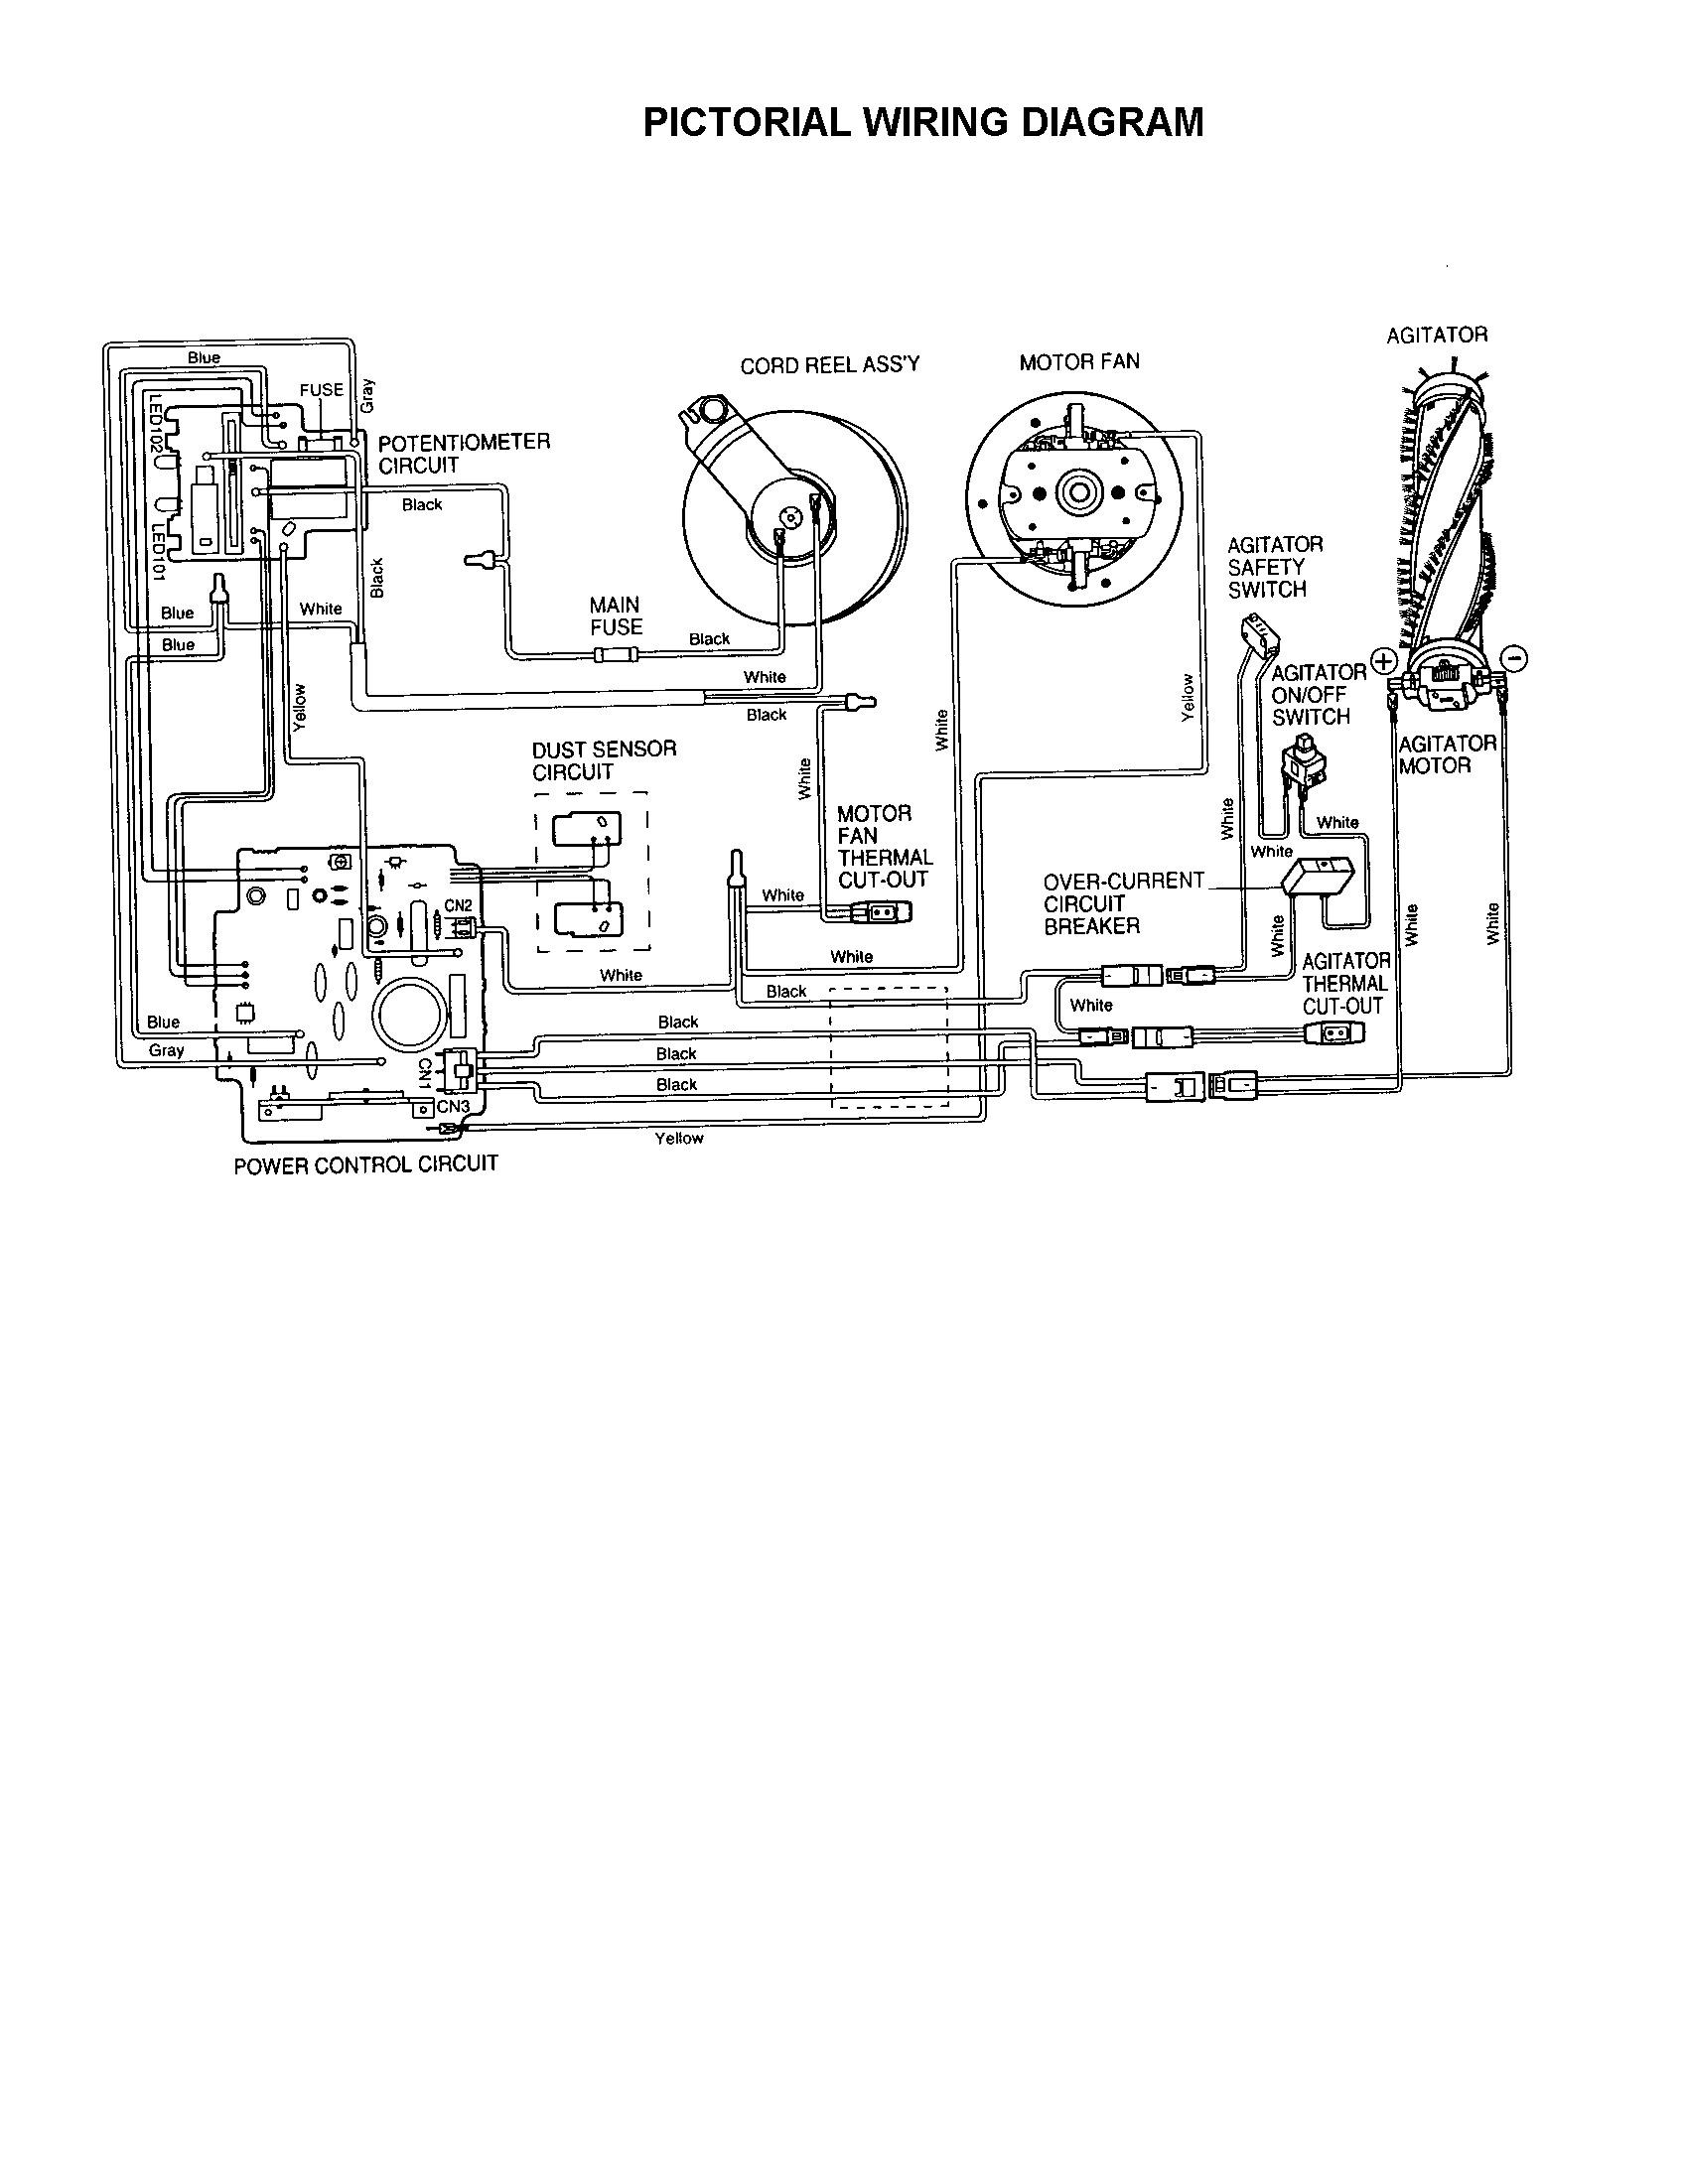 Electrolux 2100 Switch assembly Electrolux 2100 Parts Diagram Hanenhuusholli Of Electrolux 2100 Switch assembly